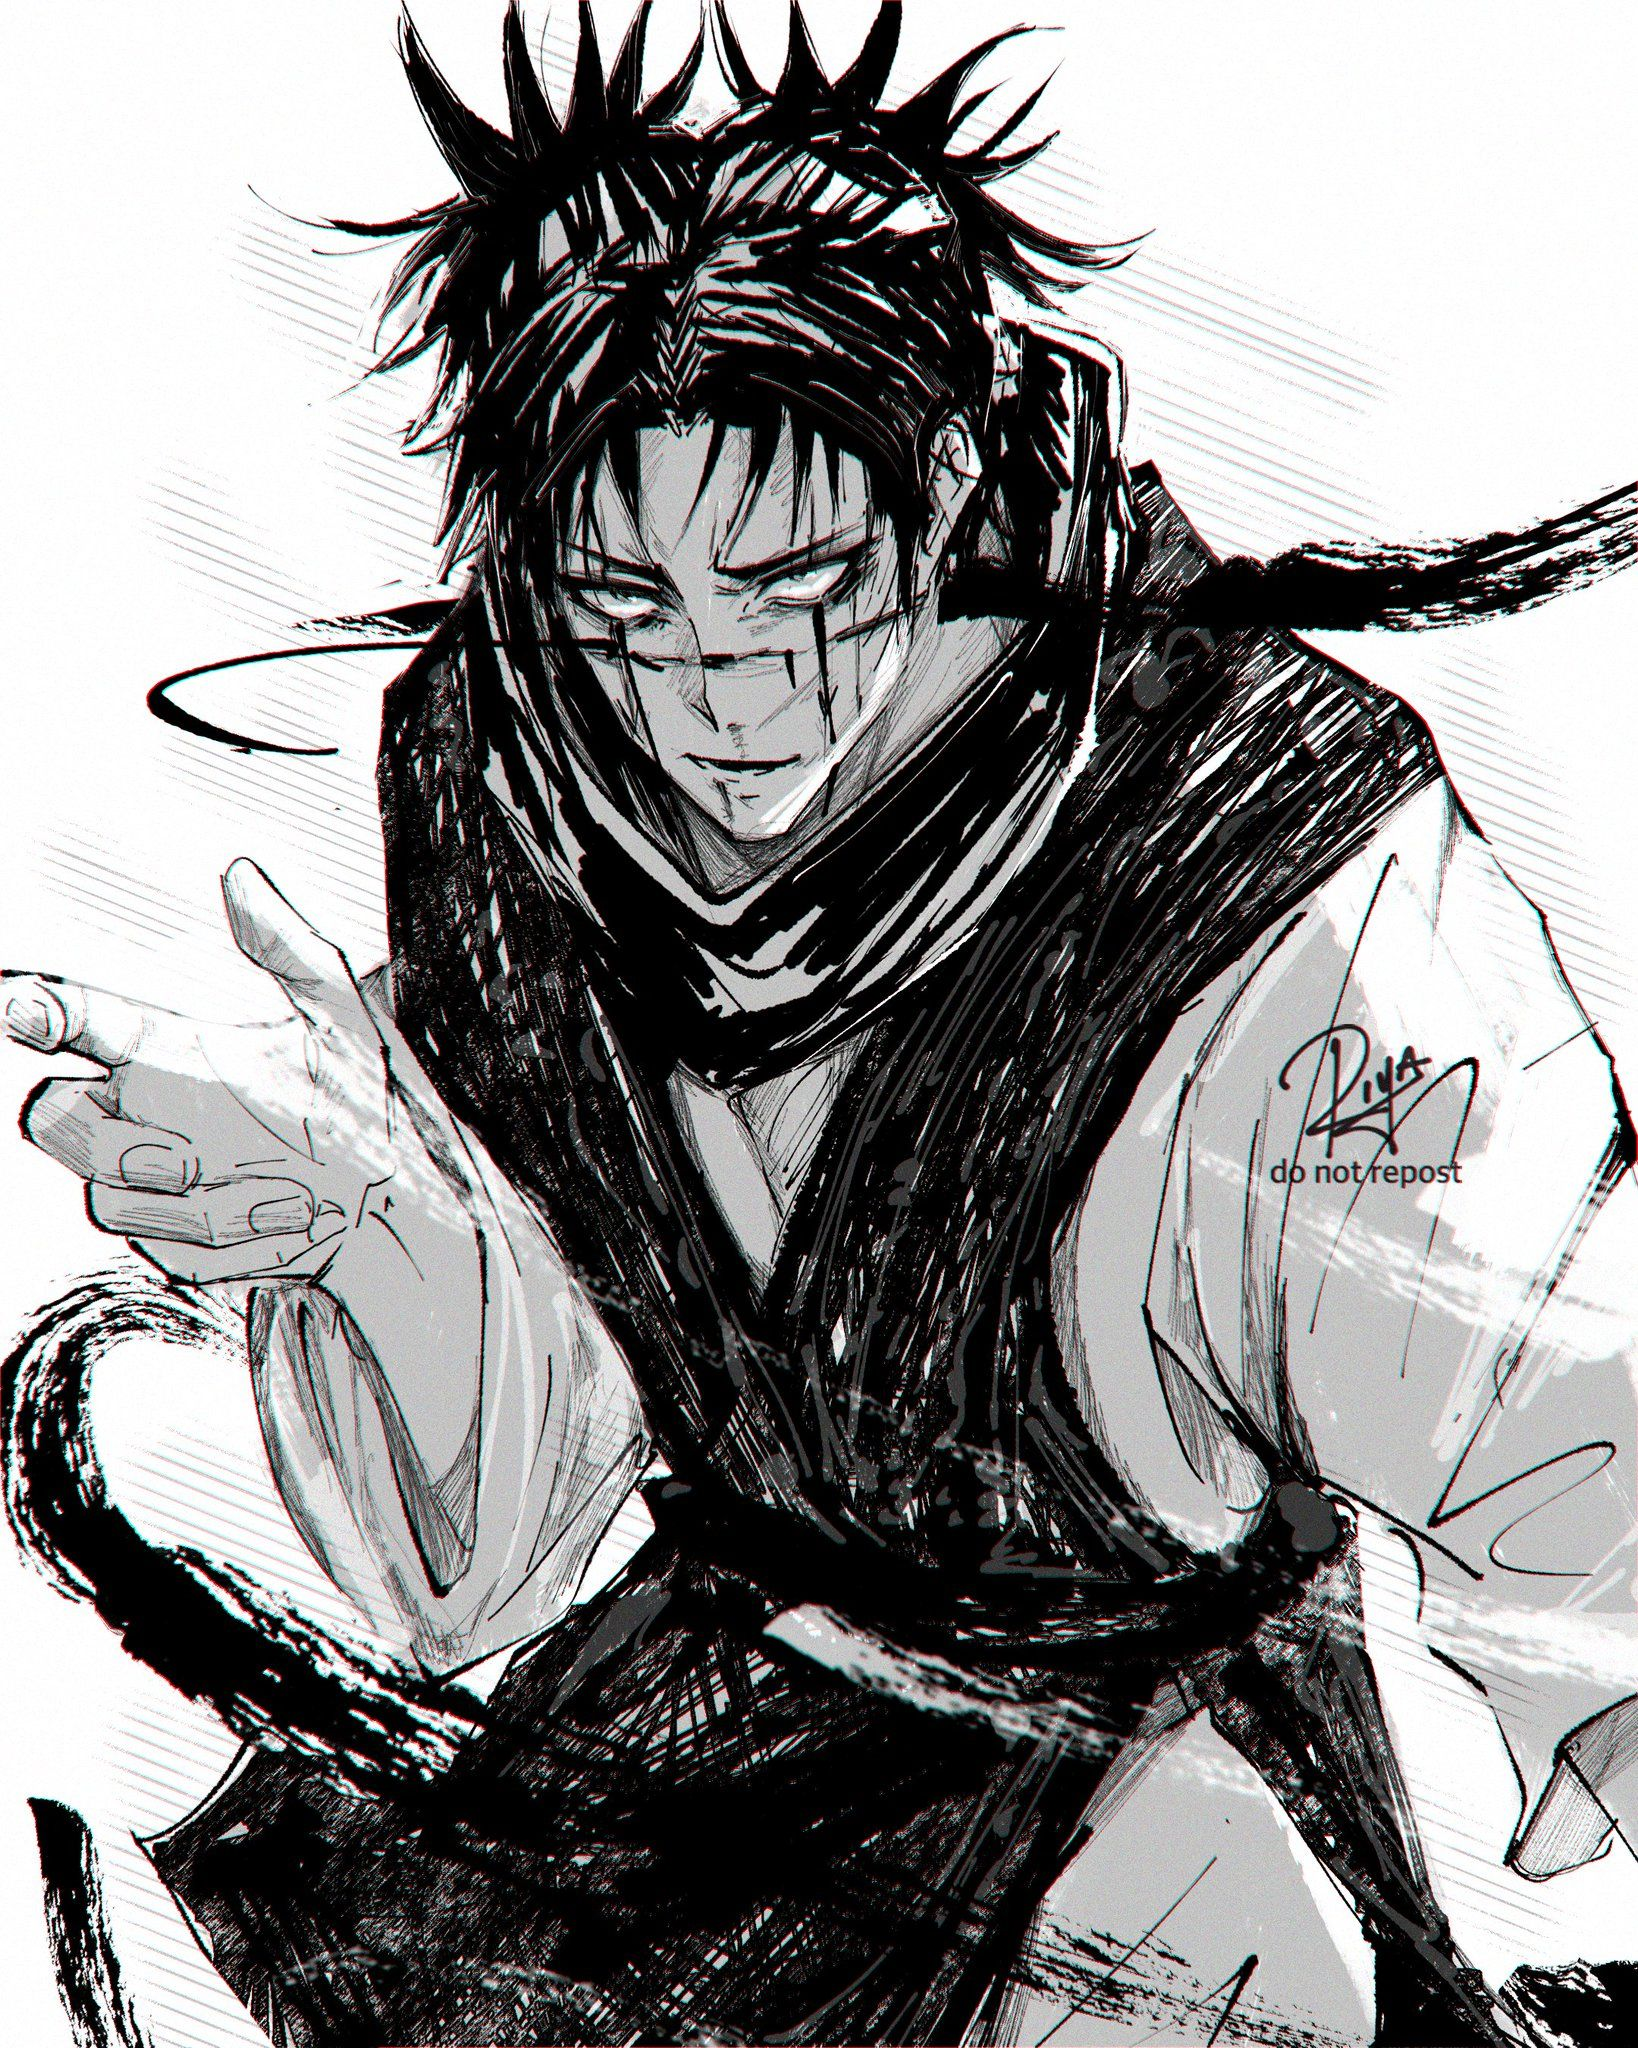 Megumi Fushiguro Stan First Human Second On Twitter Choso Vs Naoya In 2021 Jujutsu Gothic Anime Aesthetic Anime